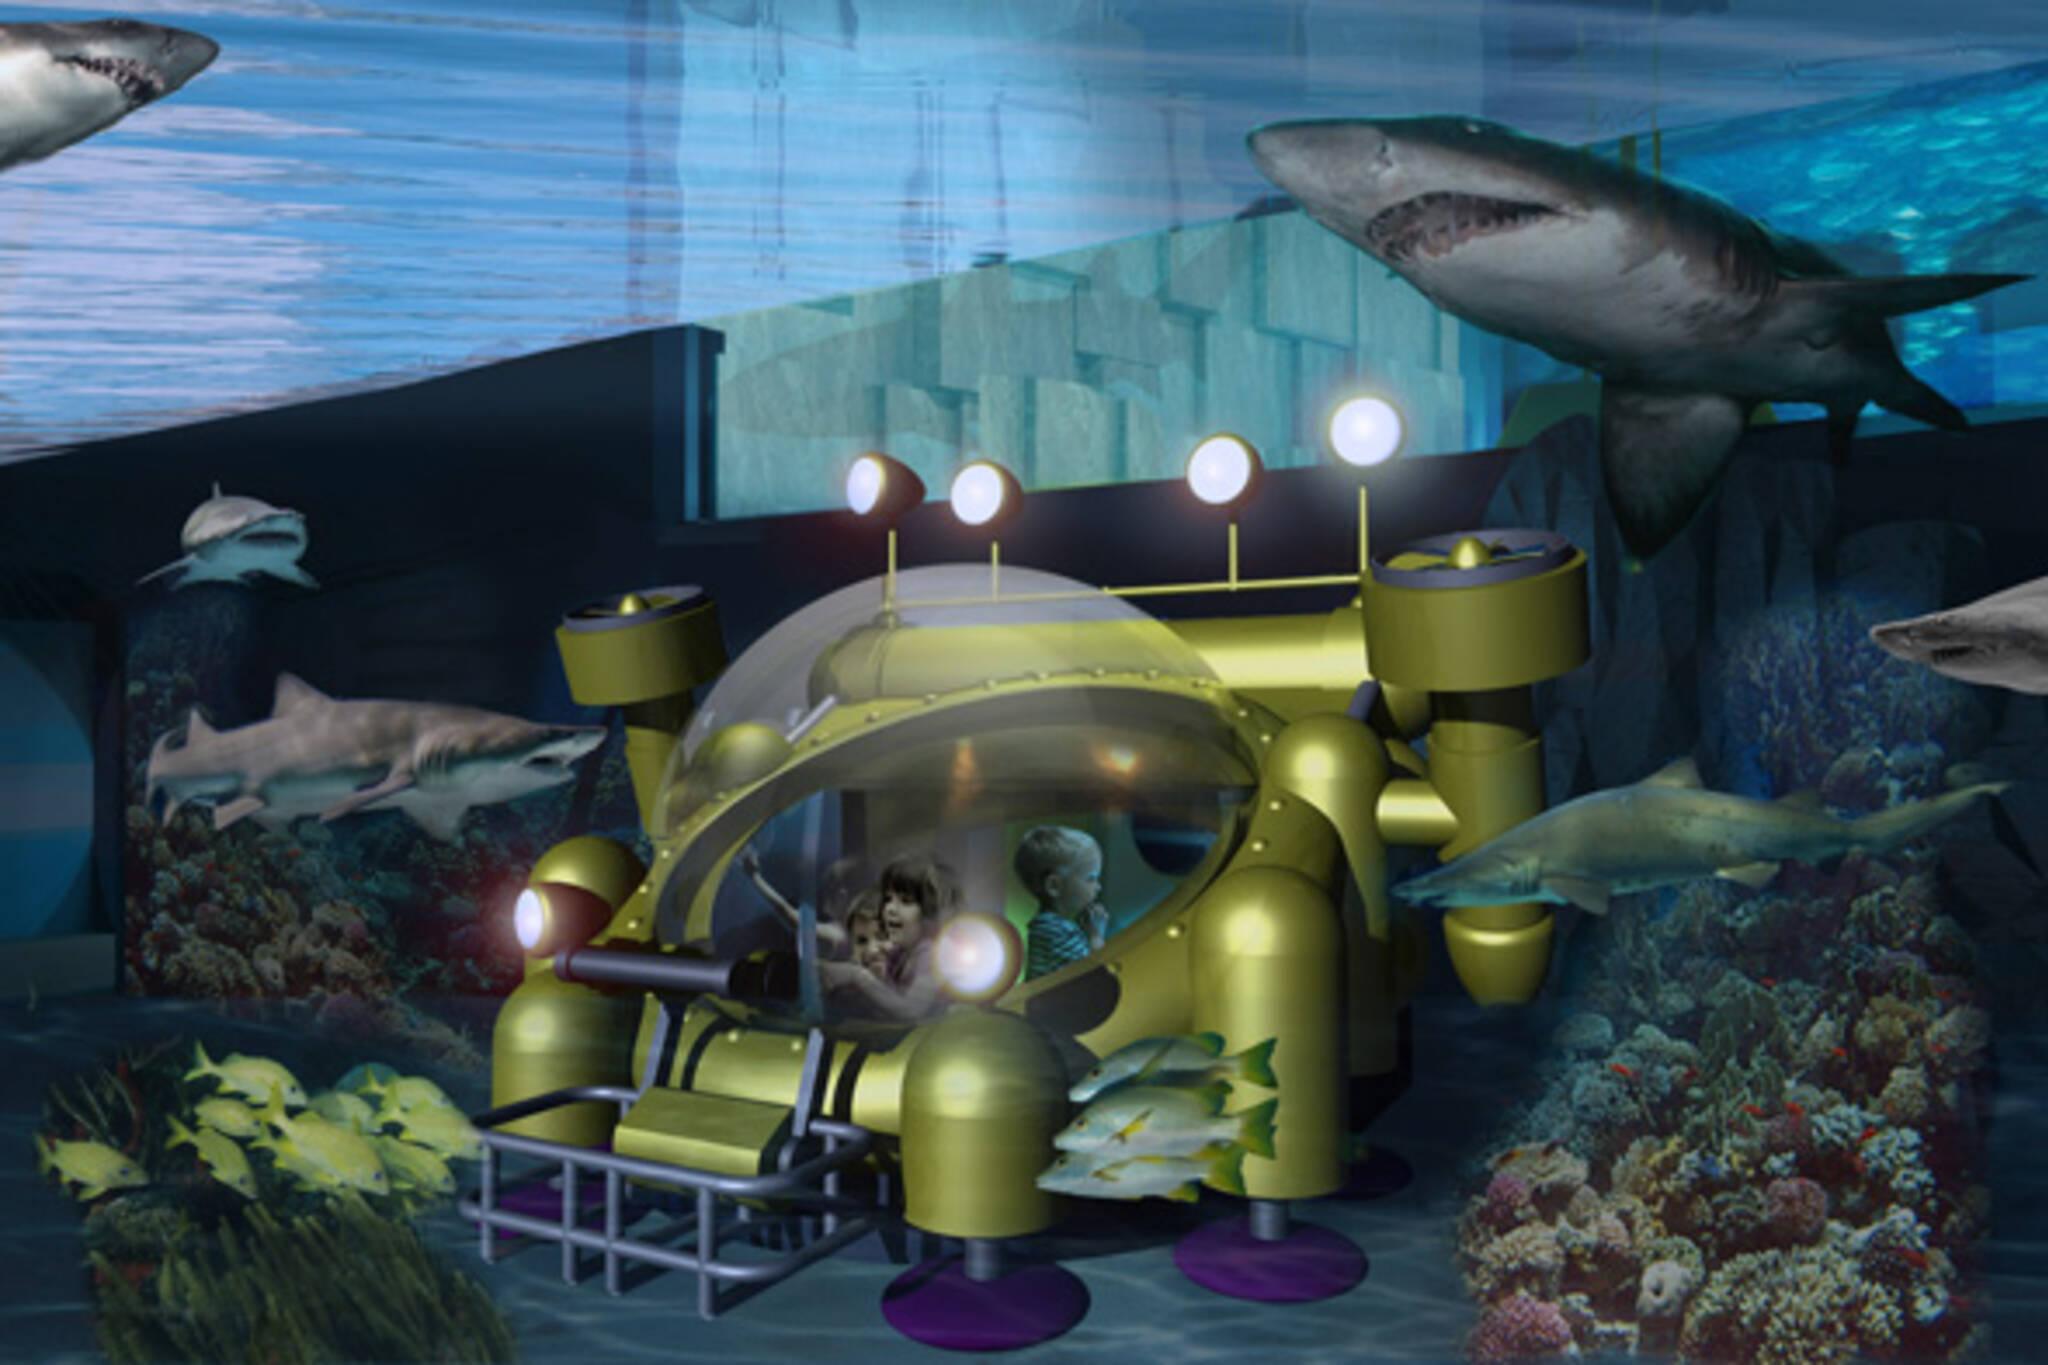 Ripley's Aquarium Toronto Canada